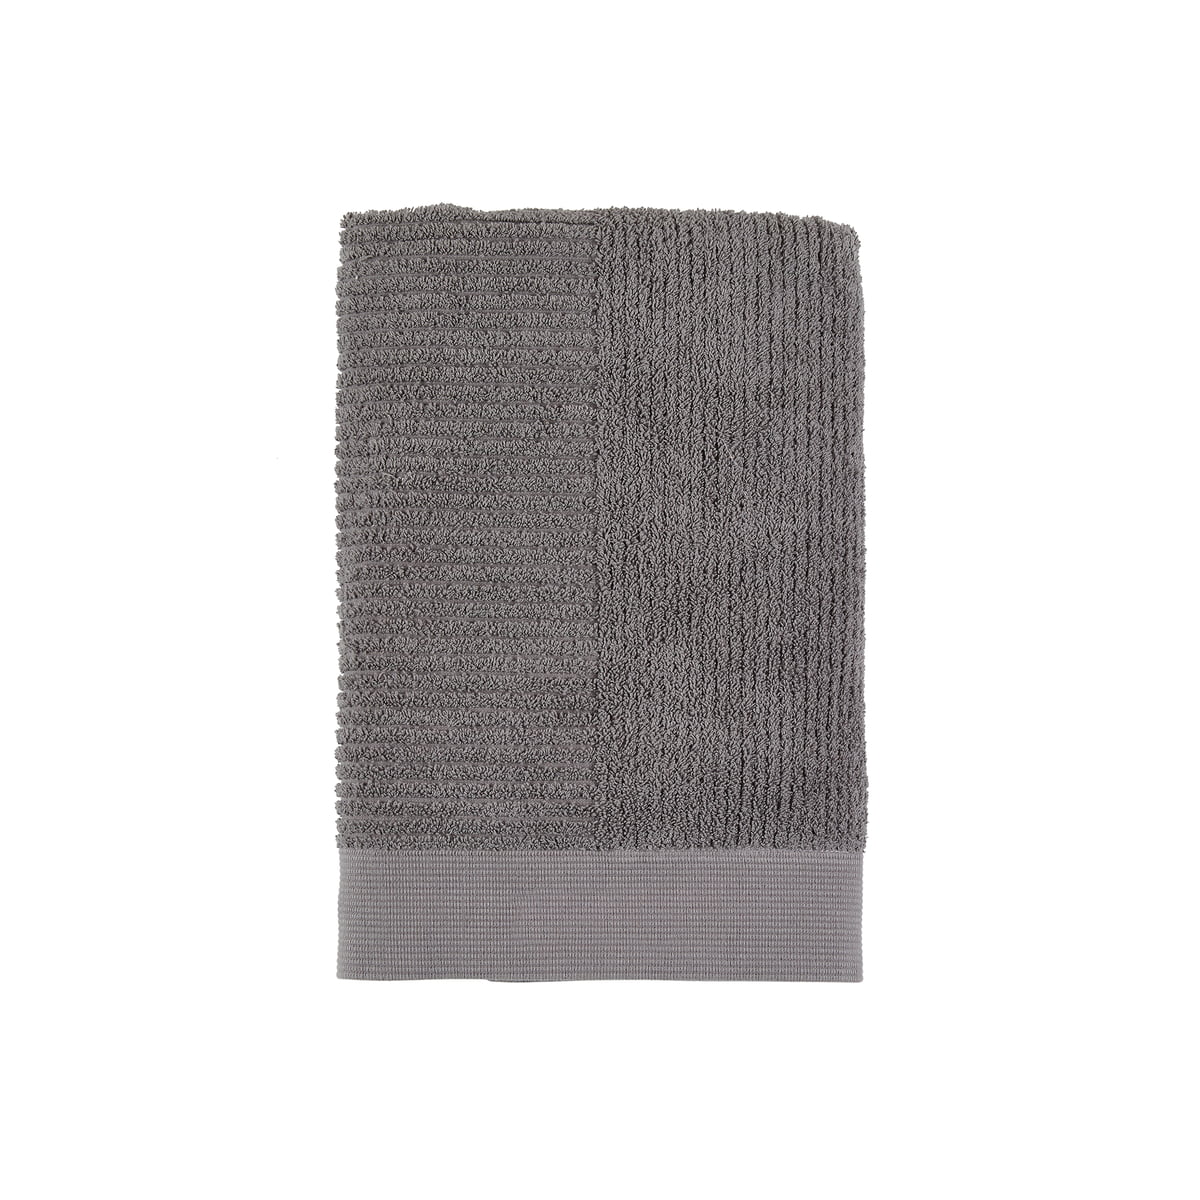 Zone Denmark - Classic Gästehandtuch, 50 x 70 cm, grau | Bad > Handtücher | Dunkelgrau | Zone